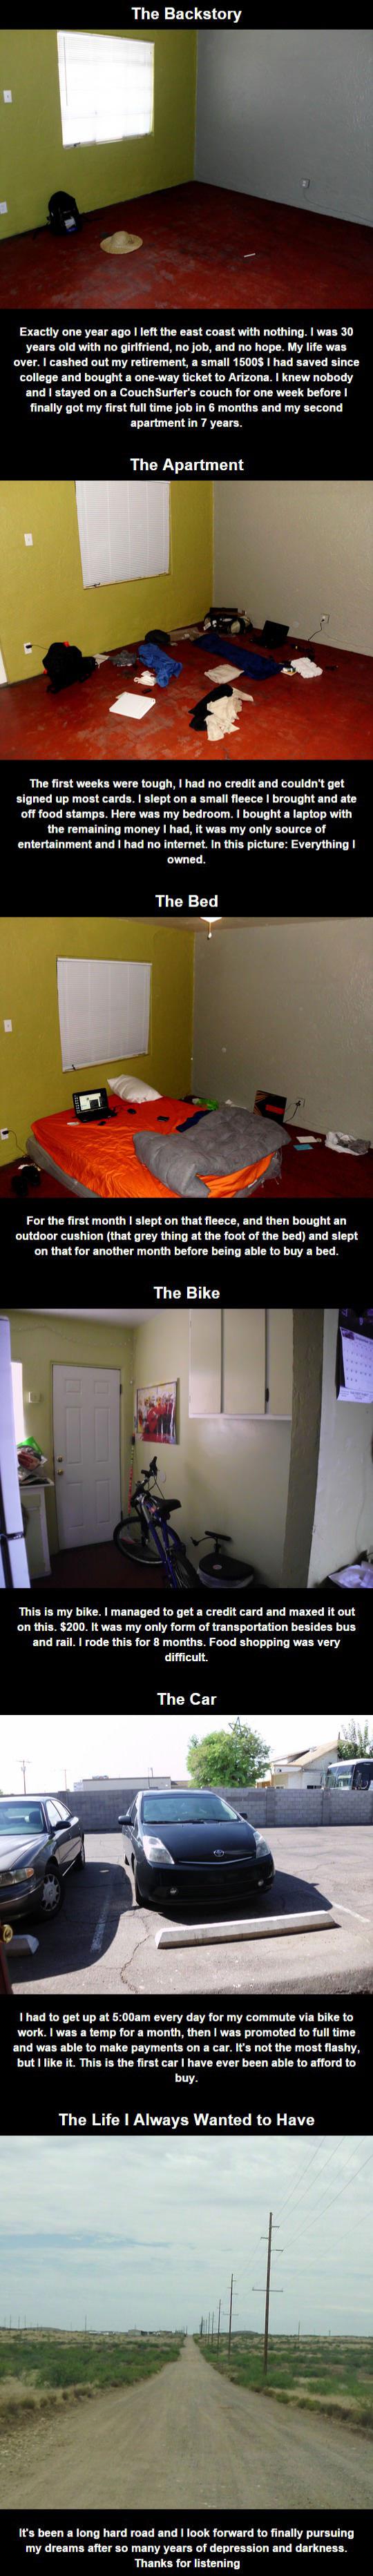 cool-story-apartment-empty-bike